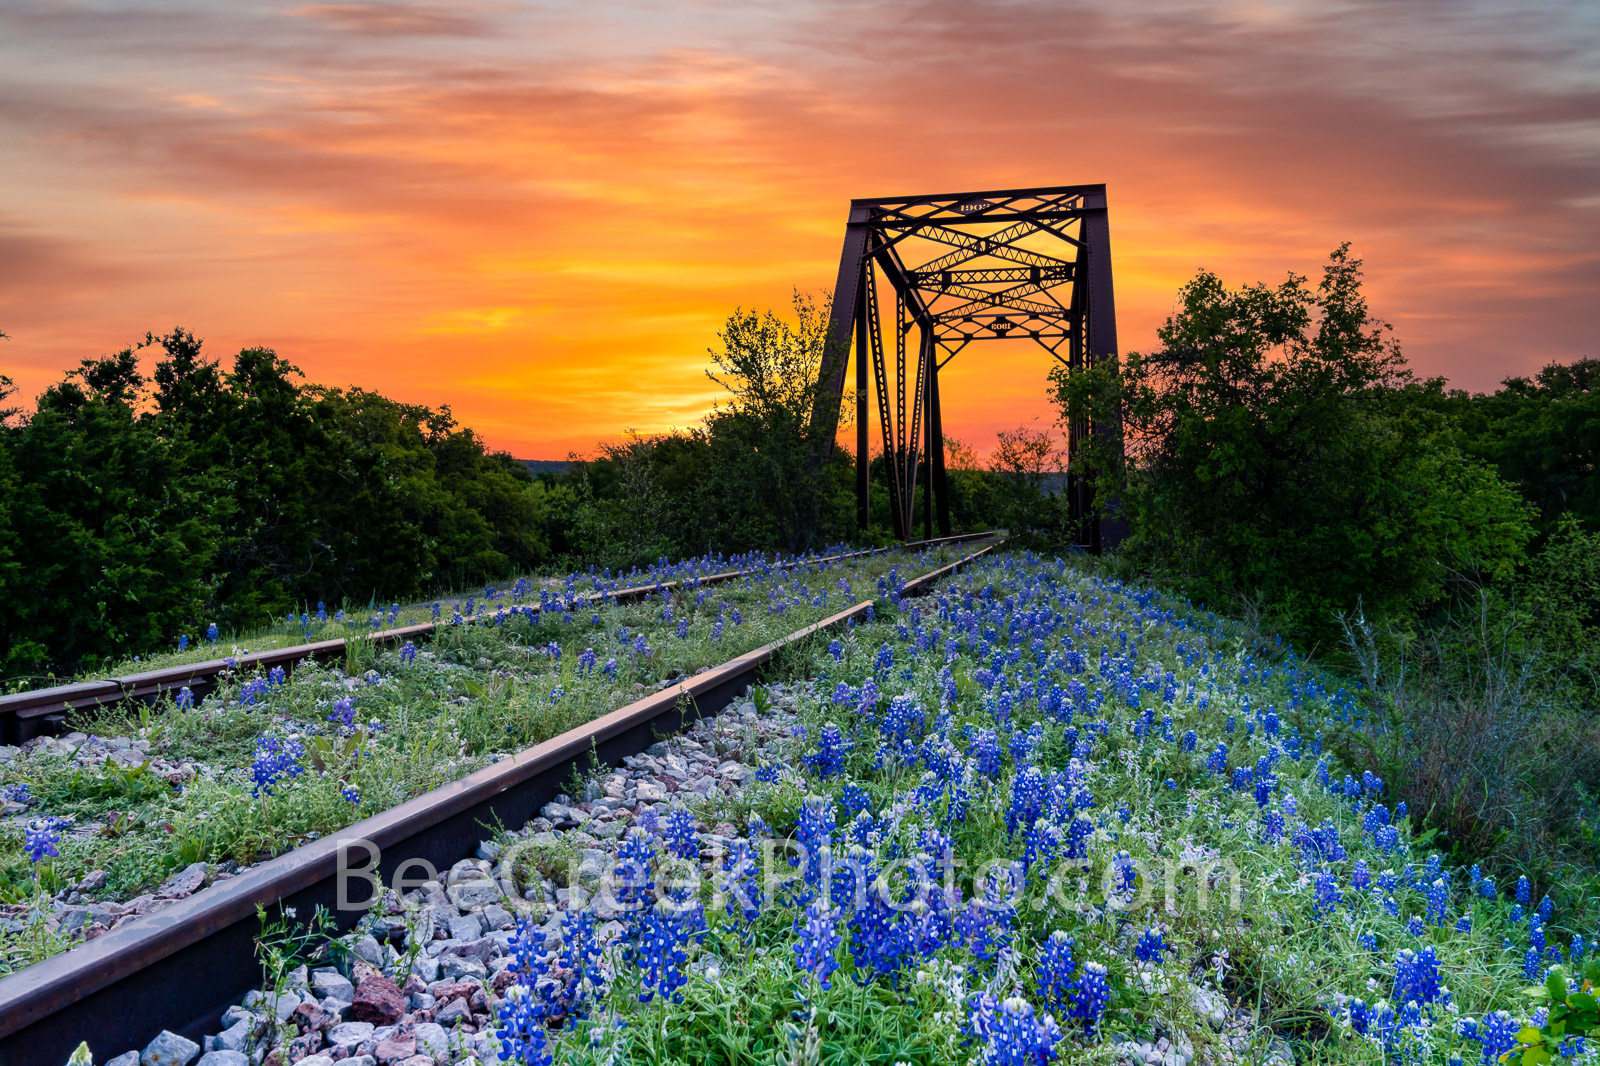 bluebonnet, texas bluebonnets, railroad tracks, tressel, sunrise, texas hill country, bluebonnets, orange sky, hill country, train tracks, sunset, west tex, bluebonnet at railroad track